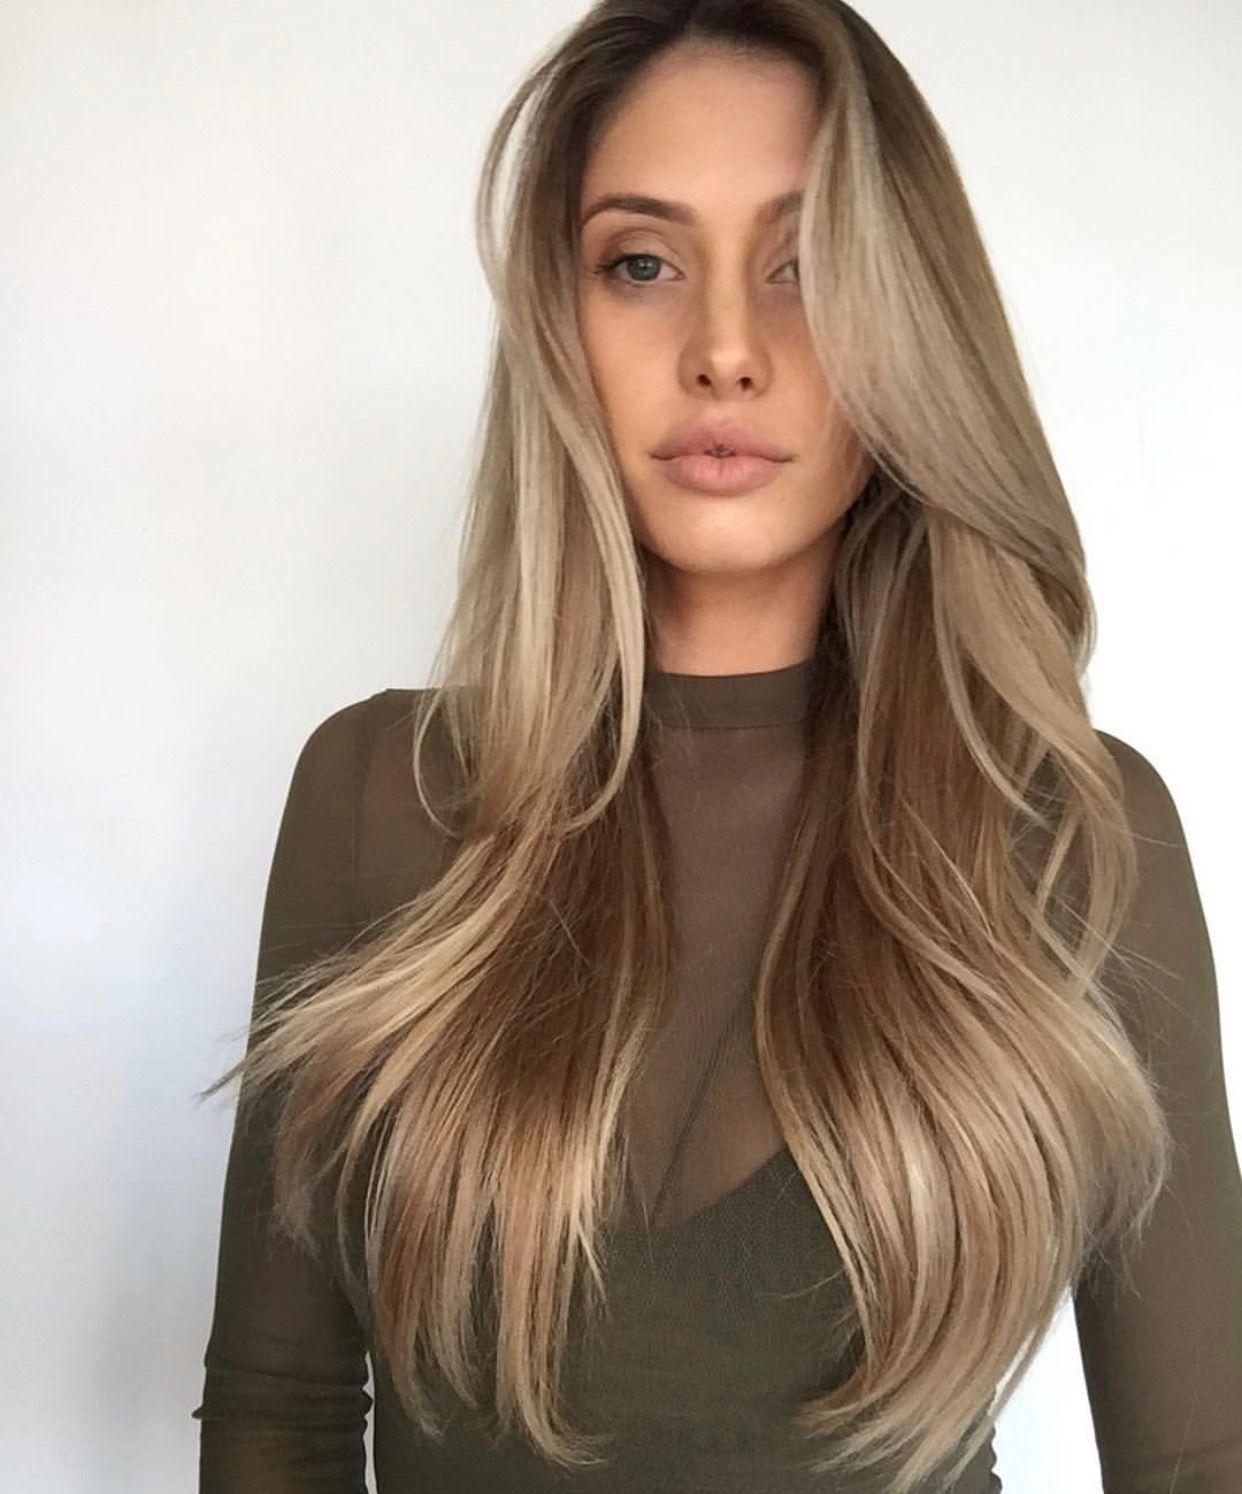 vidal sassoon long volume haircut - google search | hair